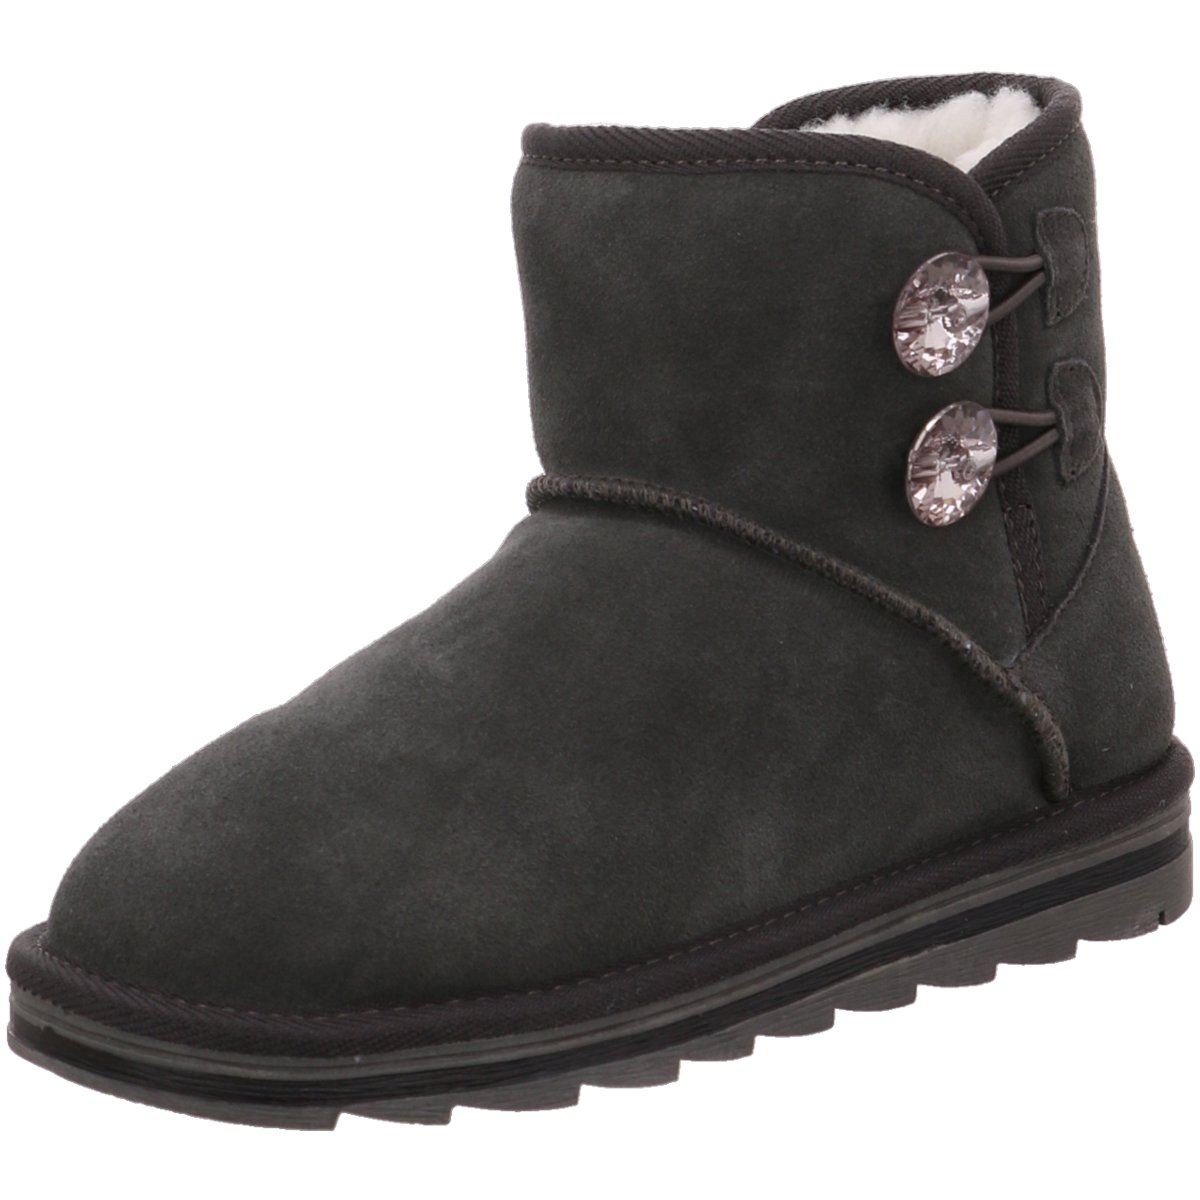 5a90159e91ab NIB NIB NIB Nike Jordan Future boot size 9.5 maroon infrared 854554 600  de09d1